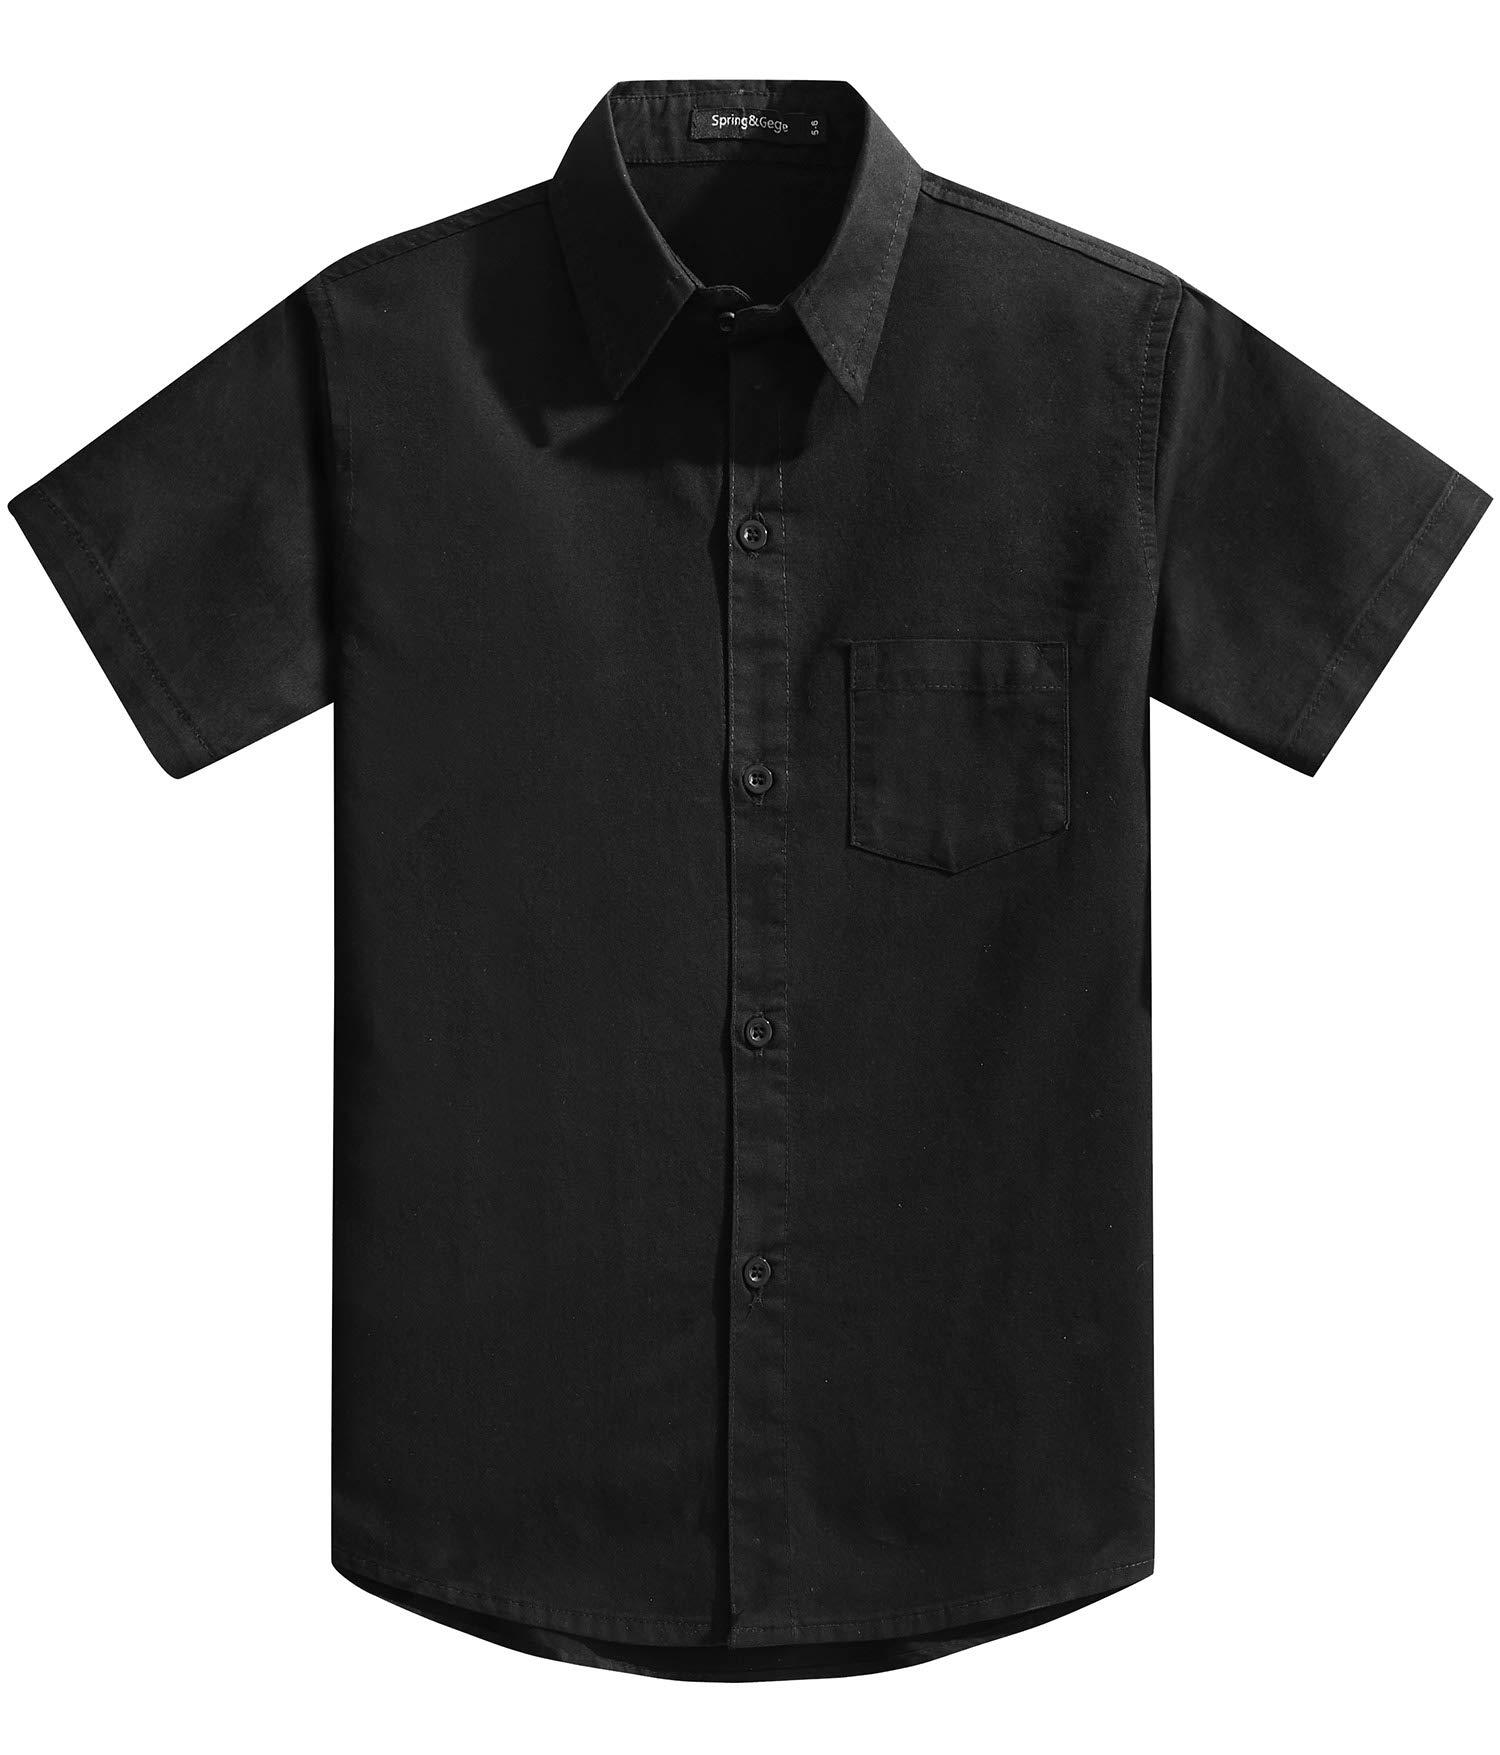 Spring&Gege Boys' Short Sleeve Solid Formal Cotton Twill Dress Shirts Black 5-6 Years